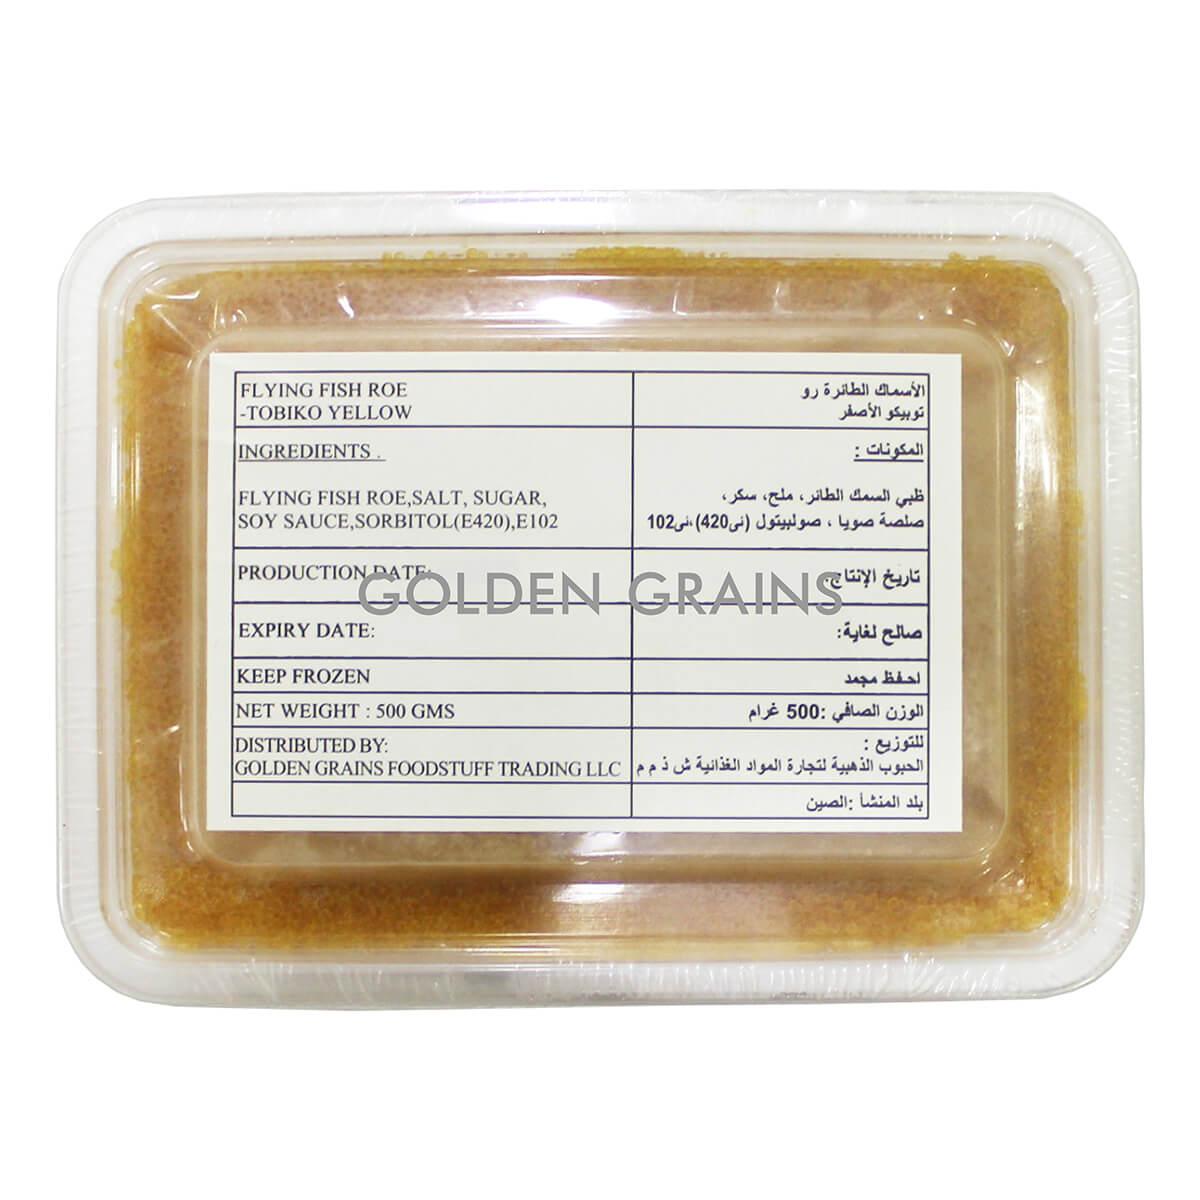 Golden Grains GGFT - Tobiko Gold China - Front.jpg